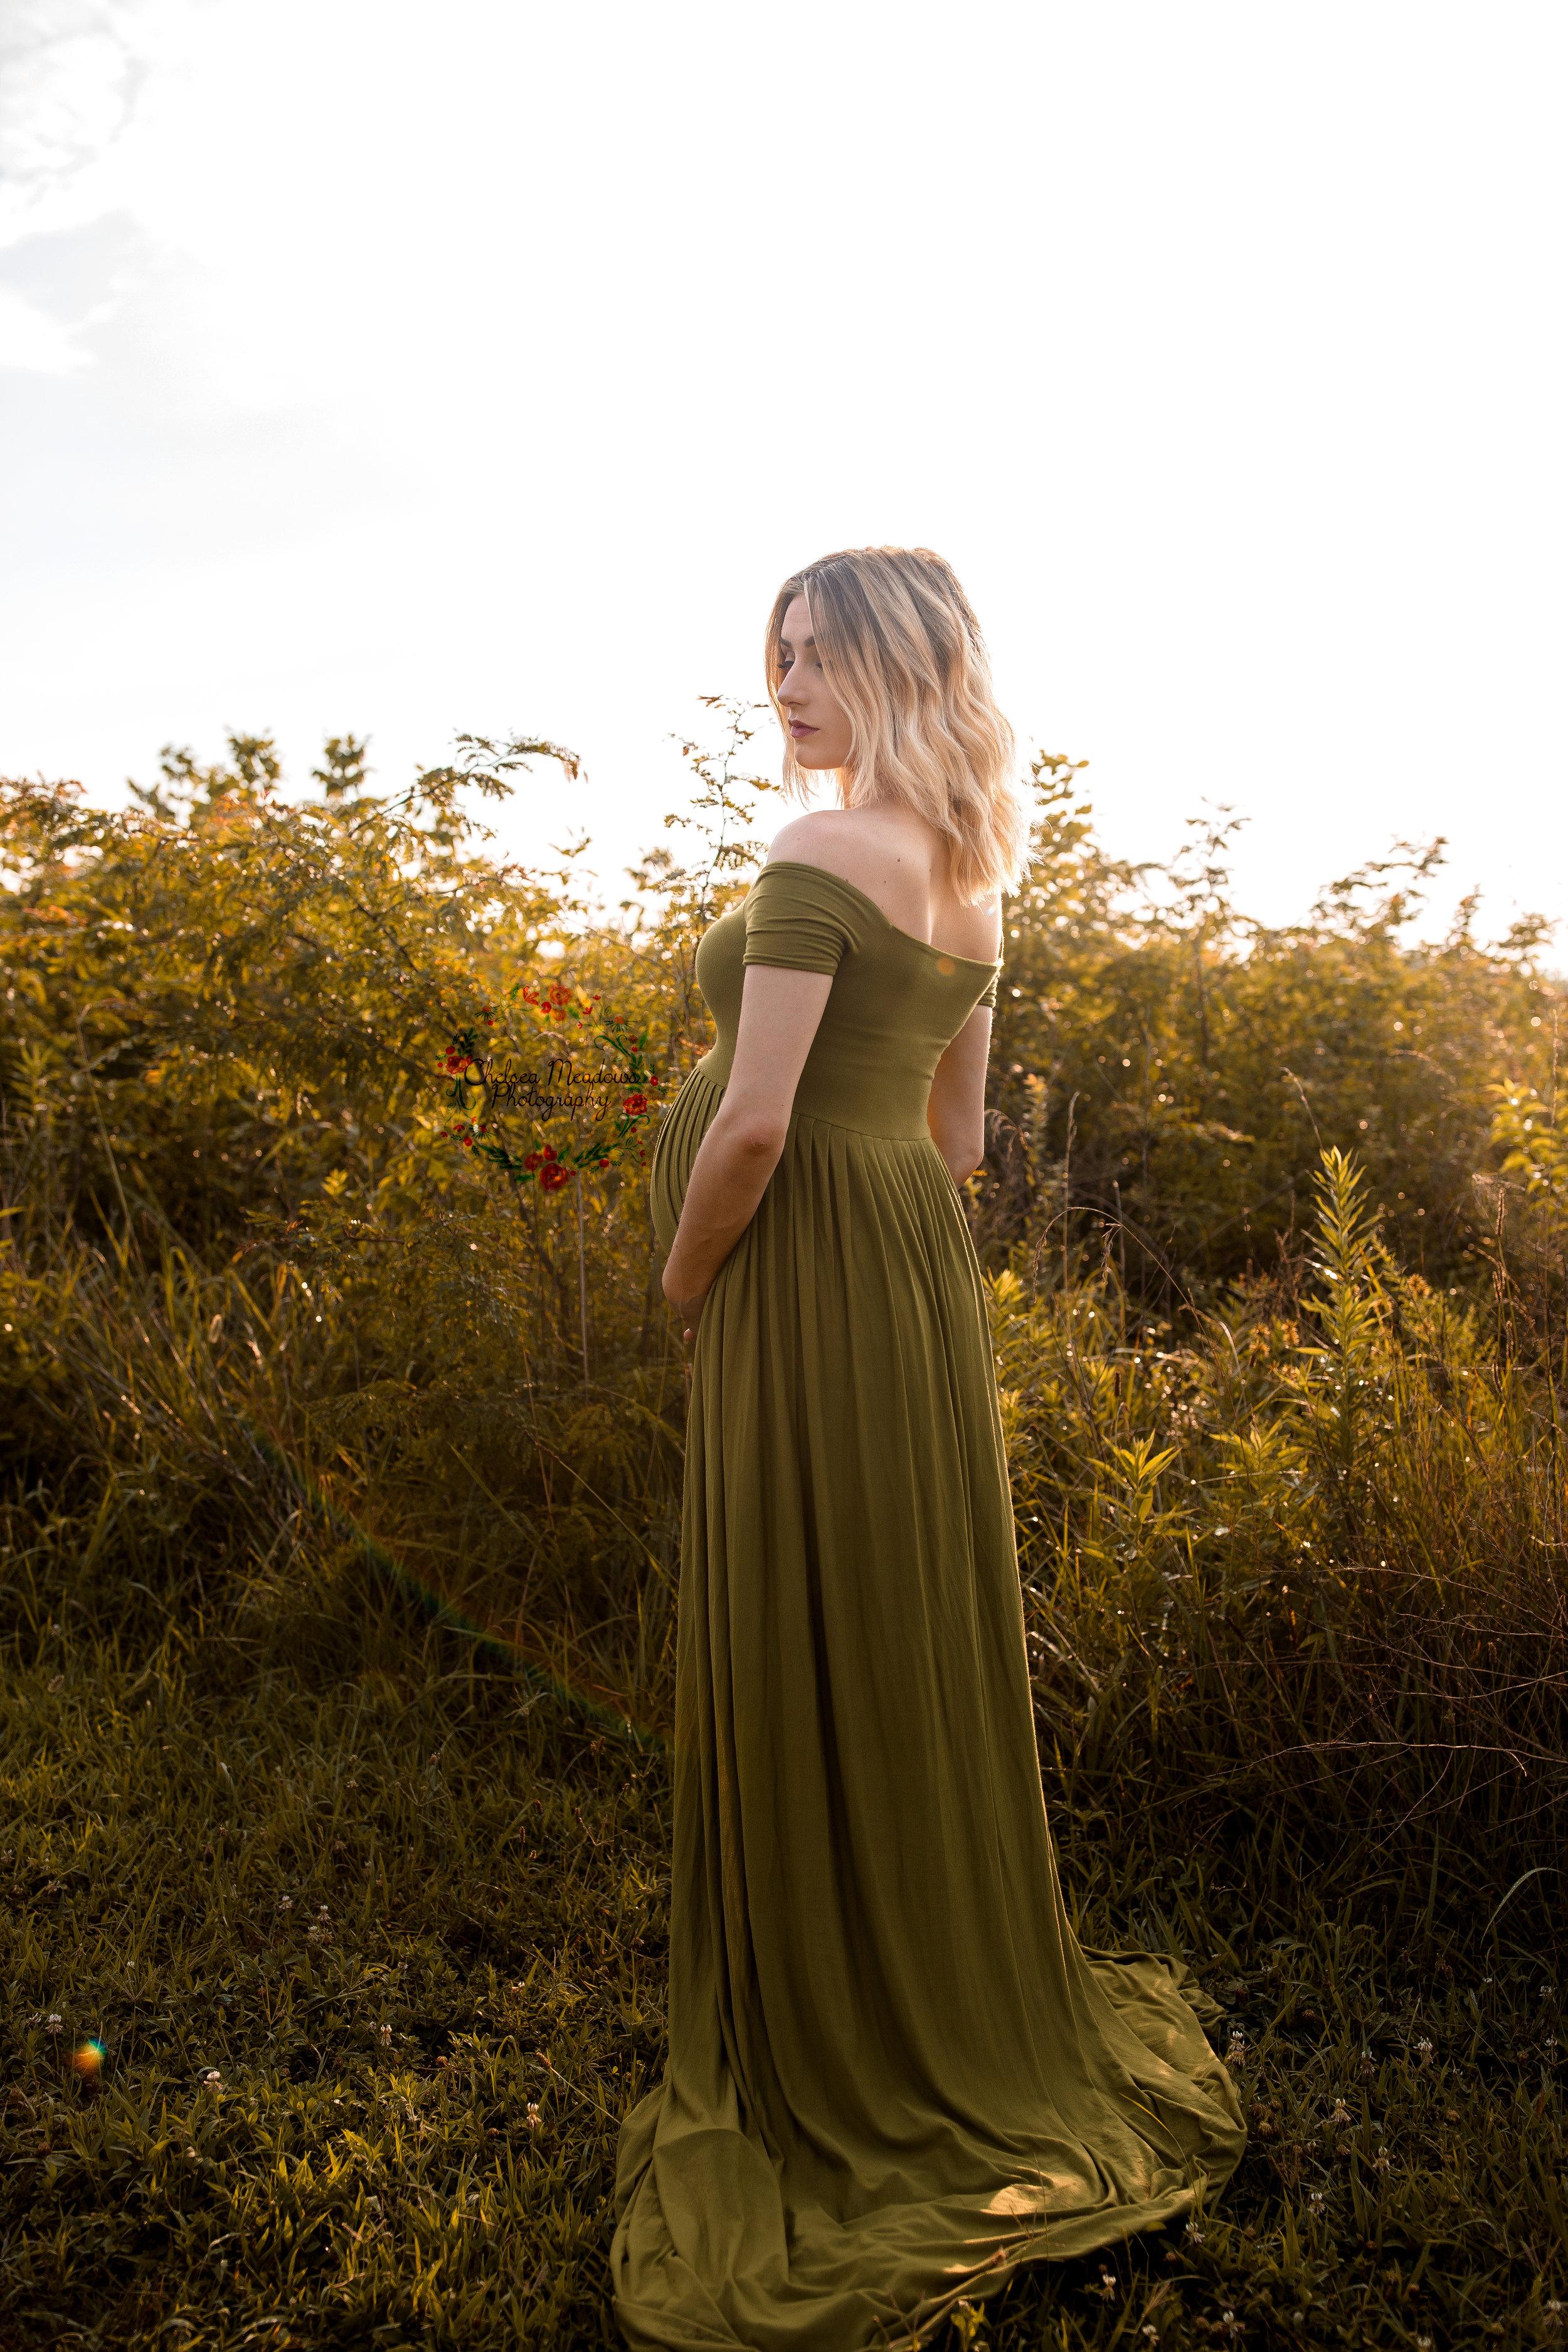 Maya Costanza Maternity - Nashville Maternity Photographer - Chelsea Meadows Photography (127).jpg